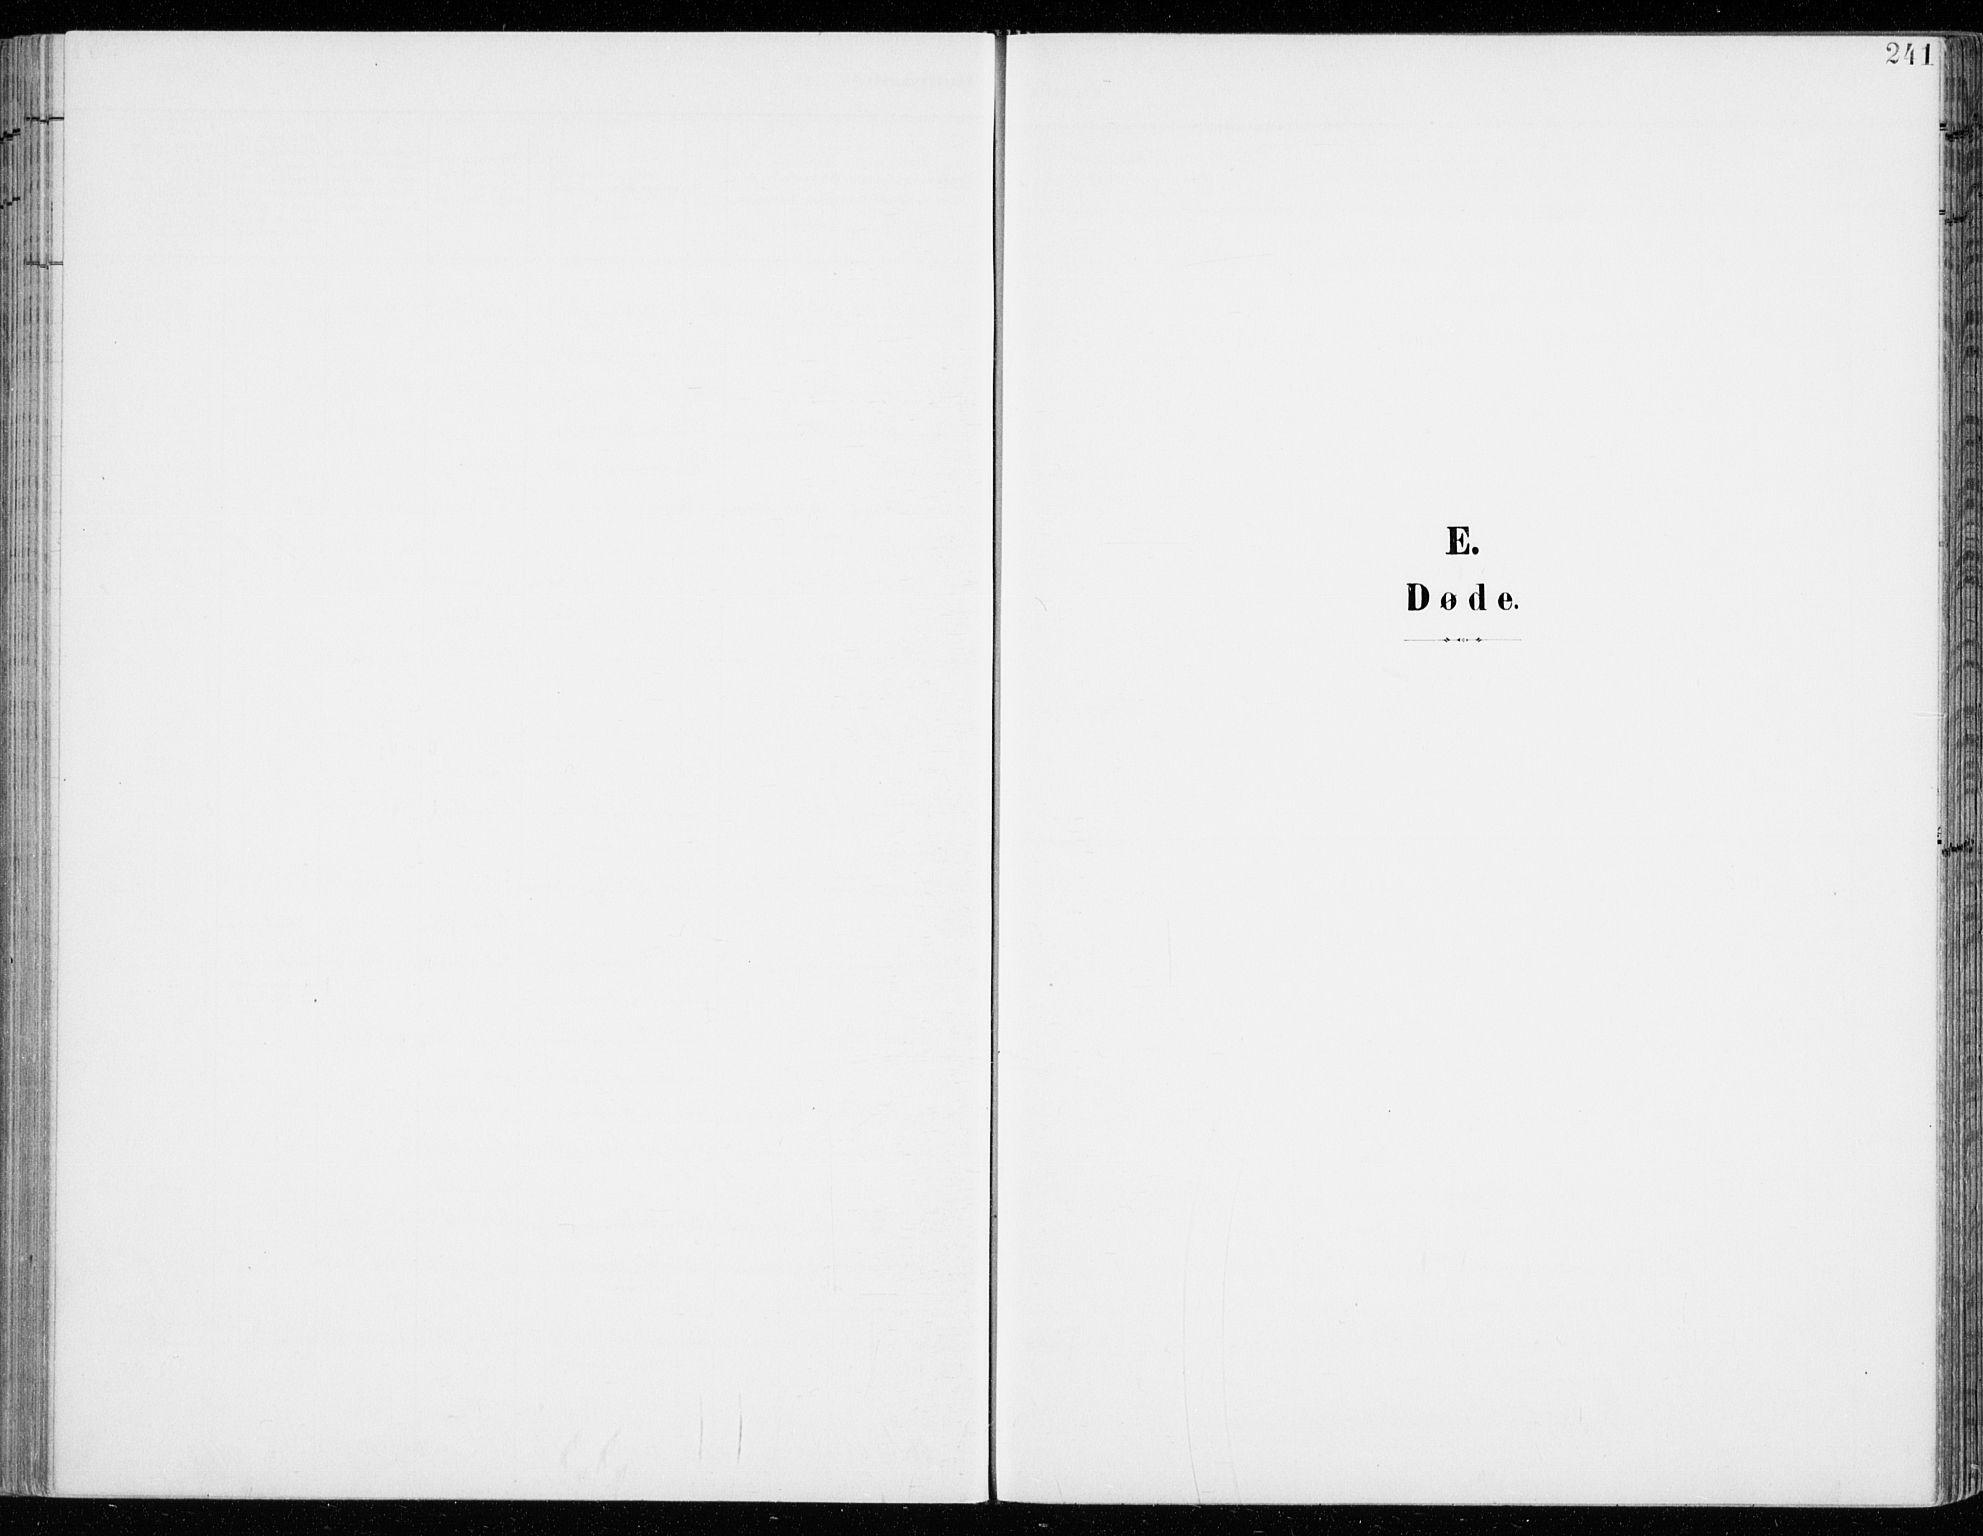 SAH, Fåberg prestekontor, H/Ha/Haa/L0011: Parish register (official) no. 11, 1899-1913, p. 241